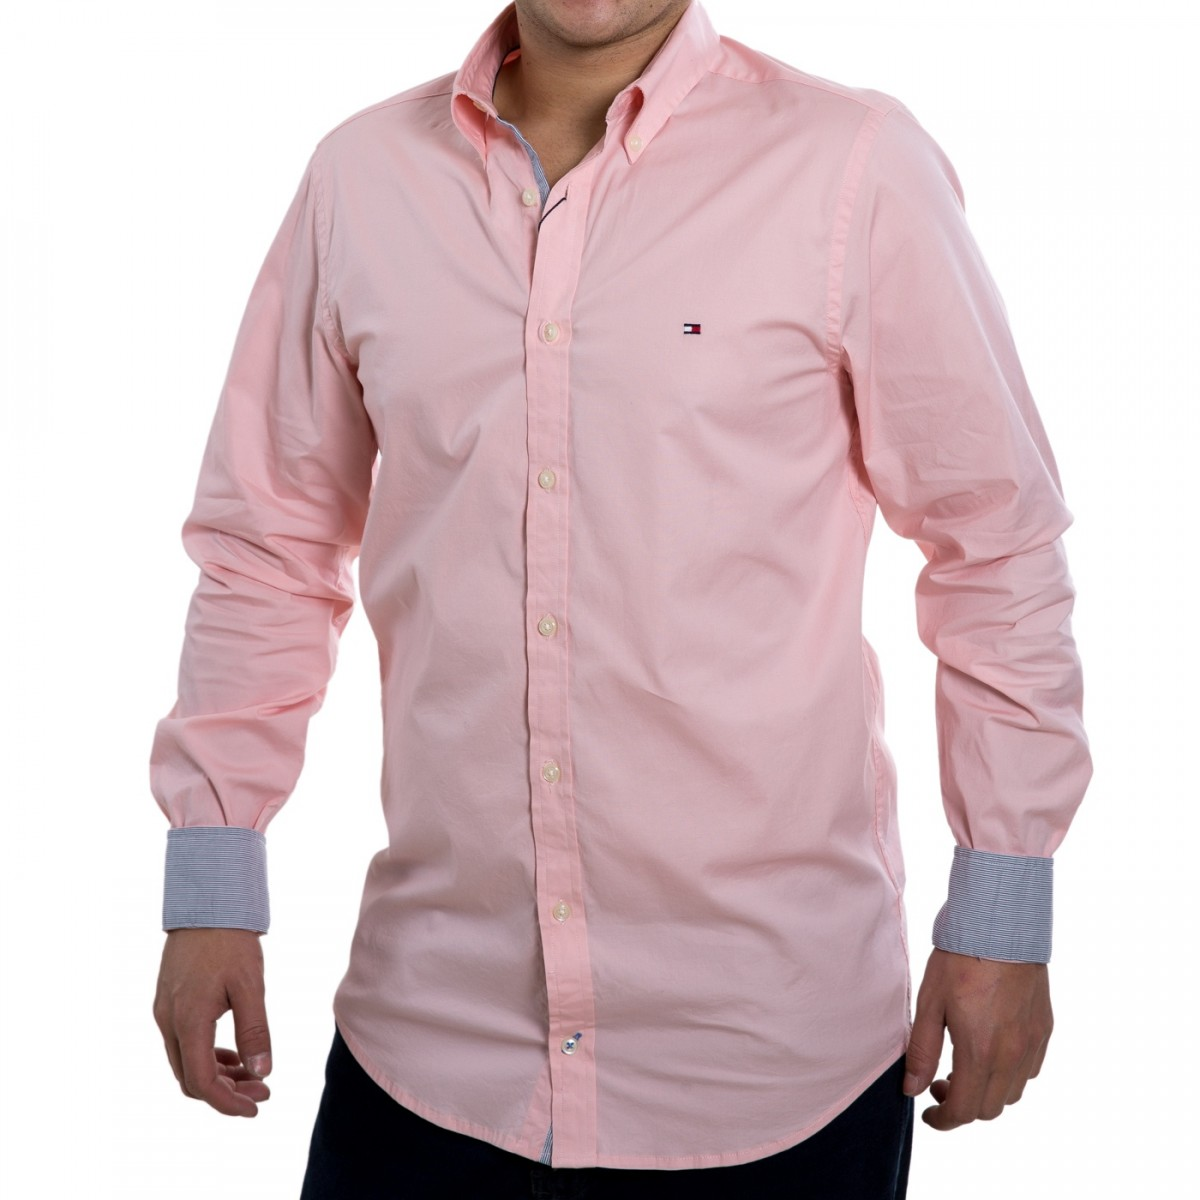 7ac89f855 Camisa Social Masculina Tommy Hilfiger Slim Th0857872321 - Rosa ...